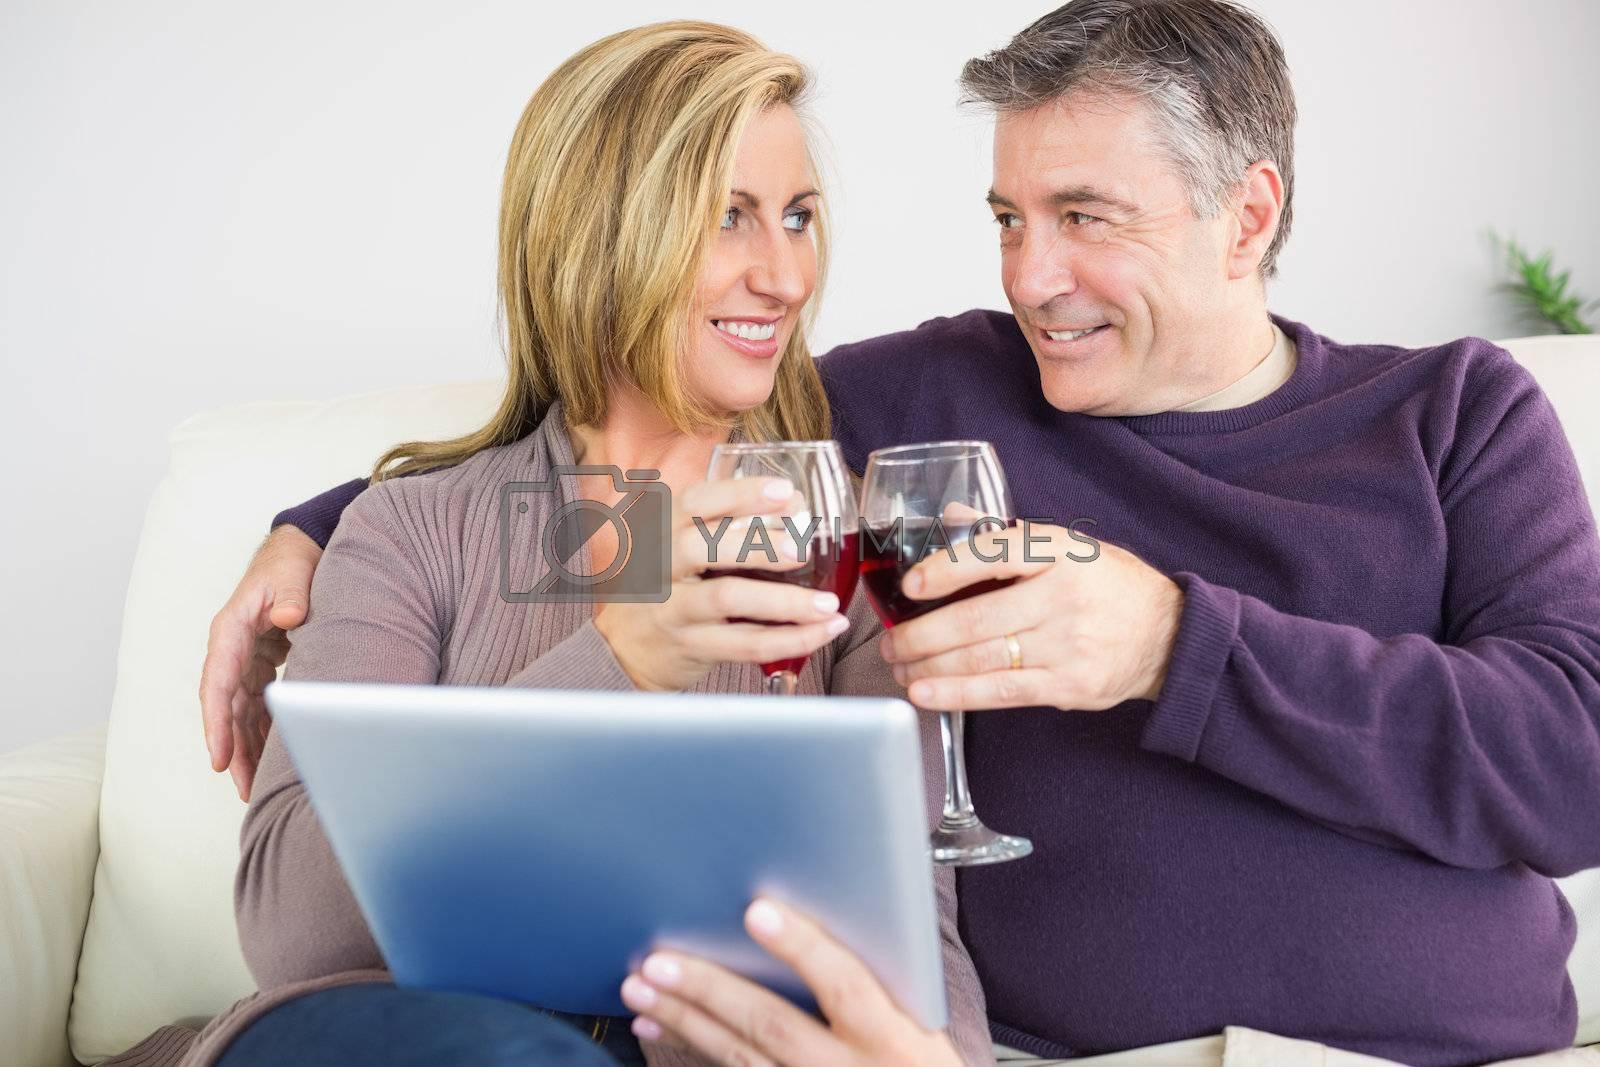 Happy couple toasting with wine sitting on sofa by Wavebreakmedia